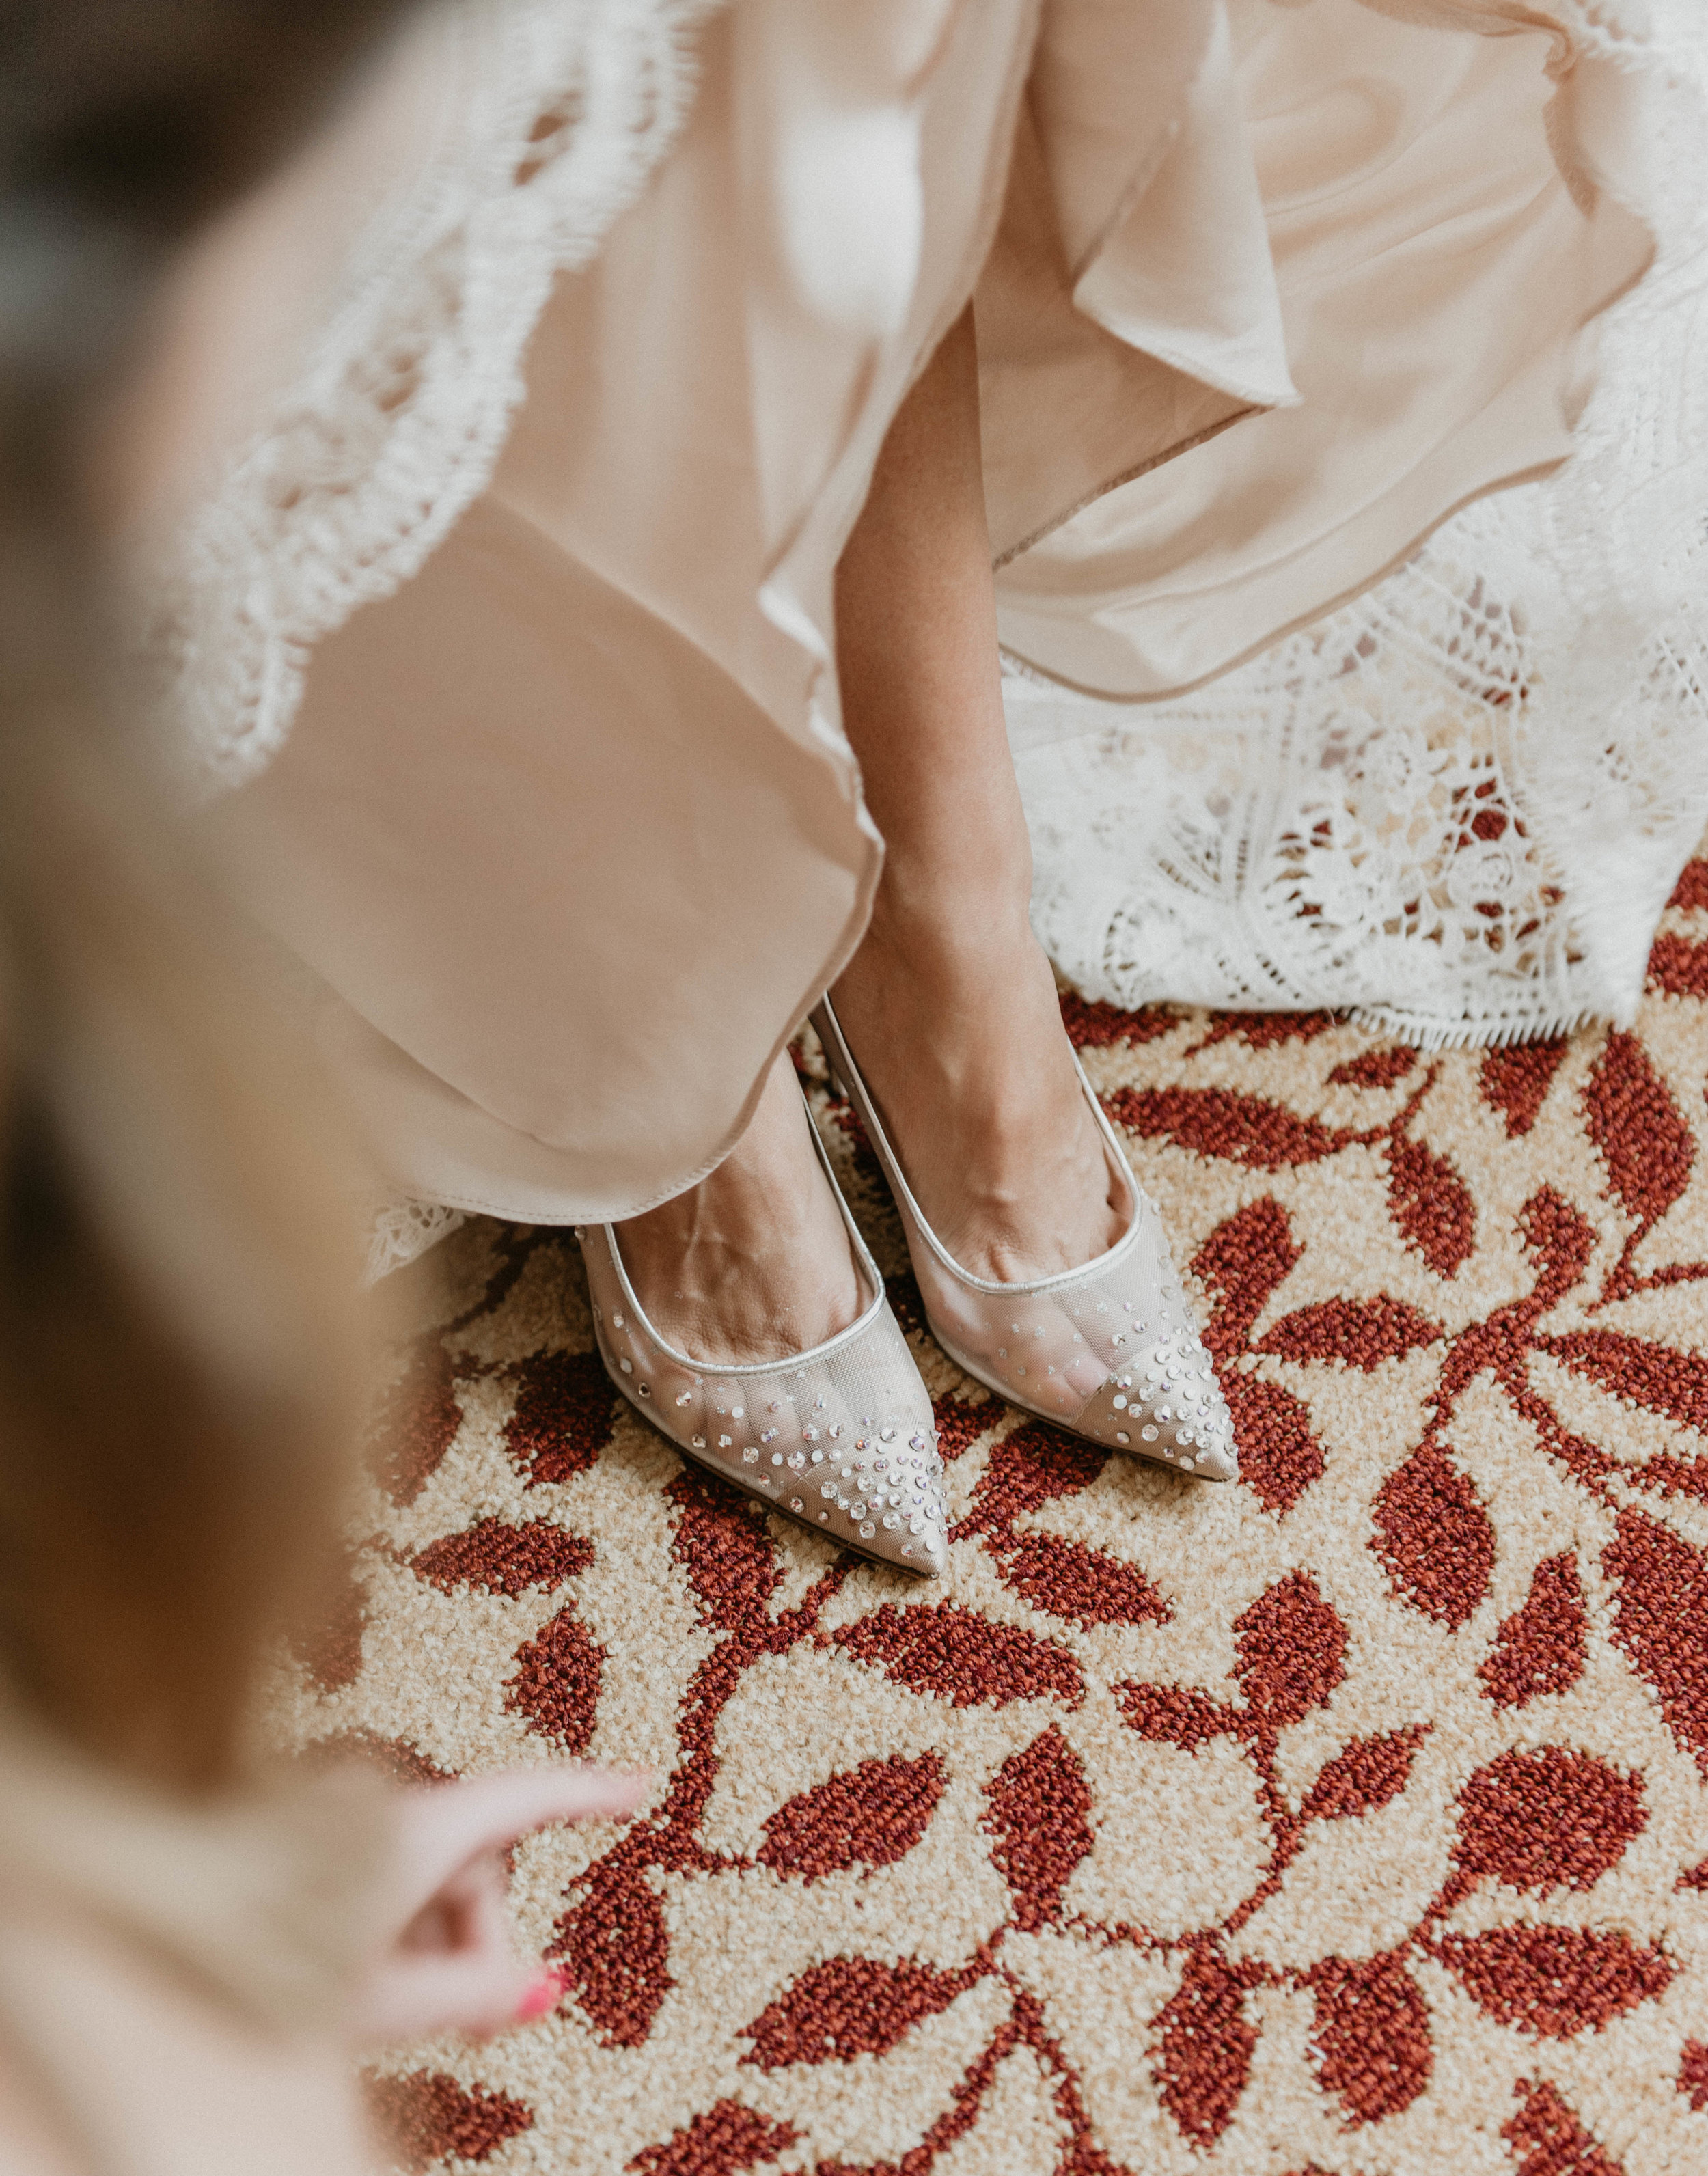 austin-texas-wedding-photography-1778-photographie-24.jpg